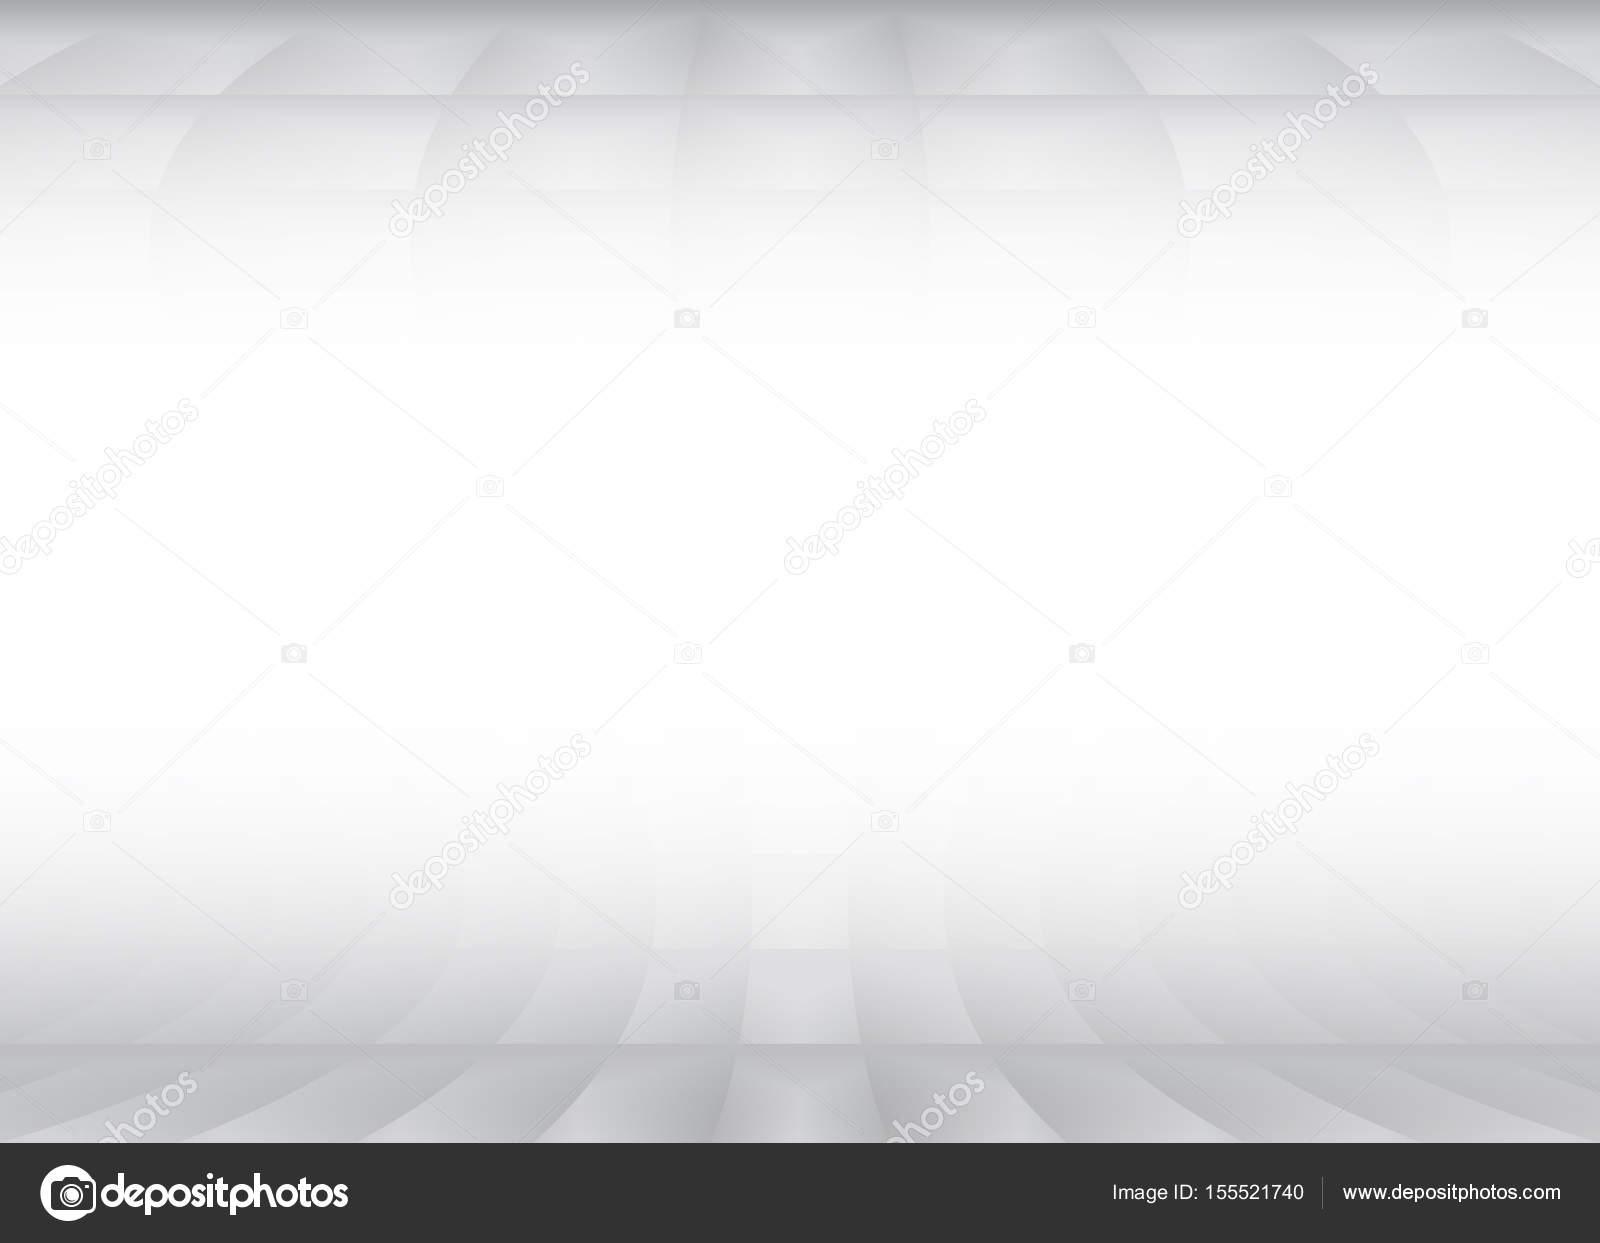 visio background